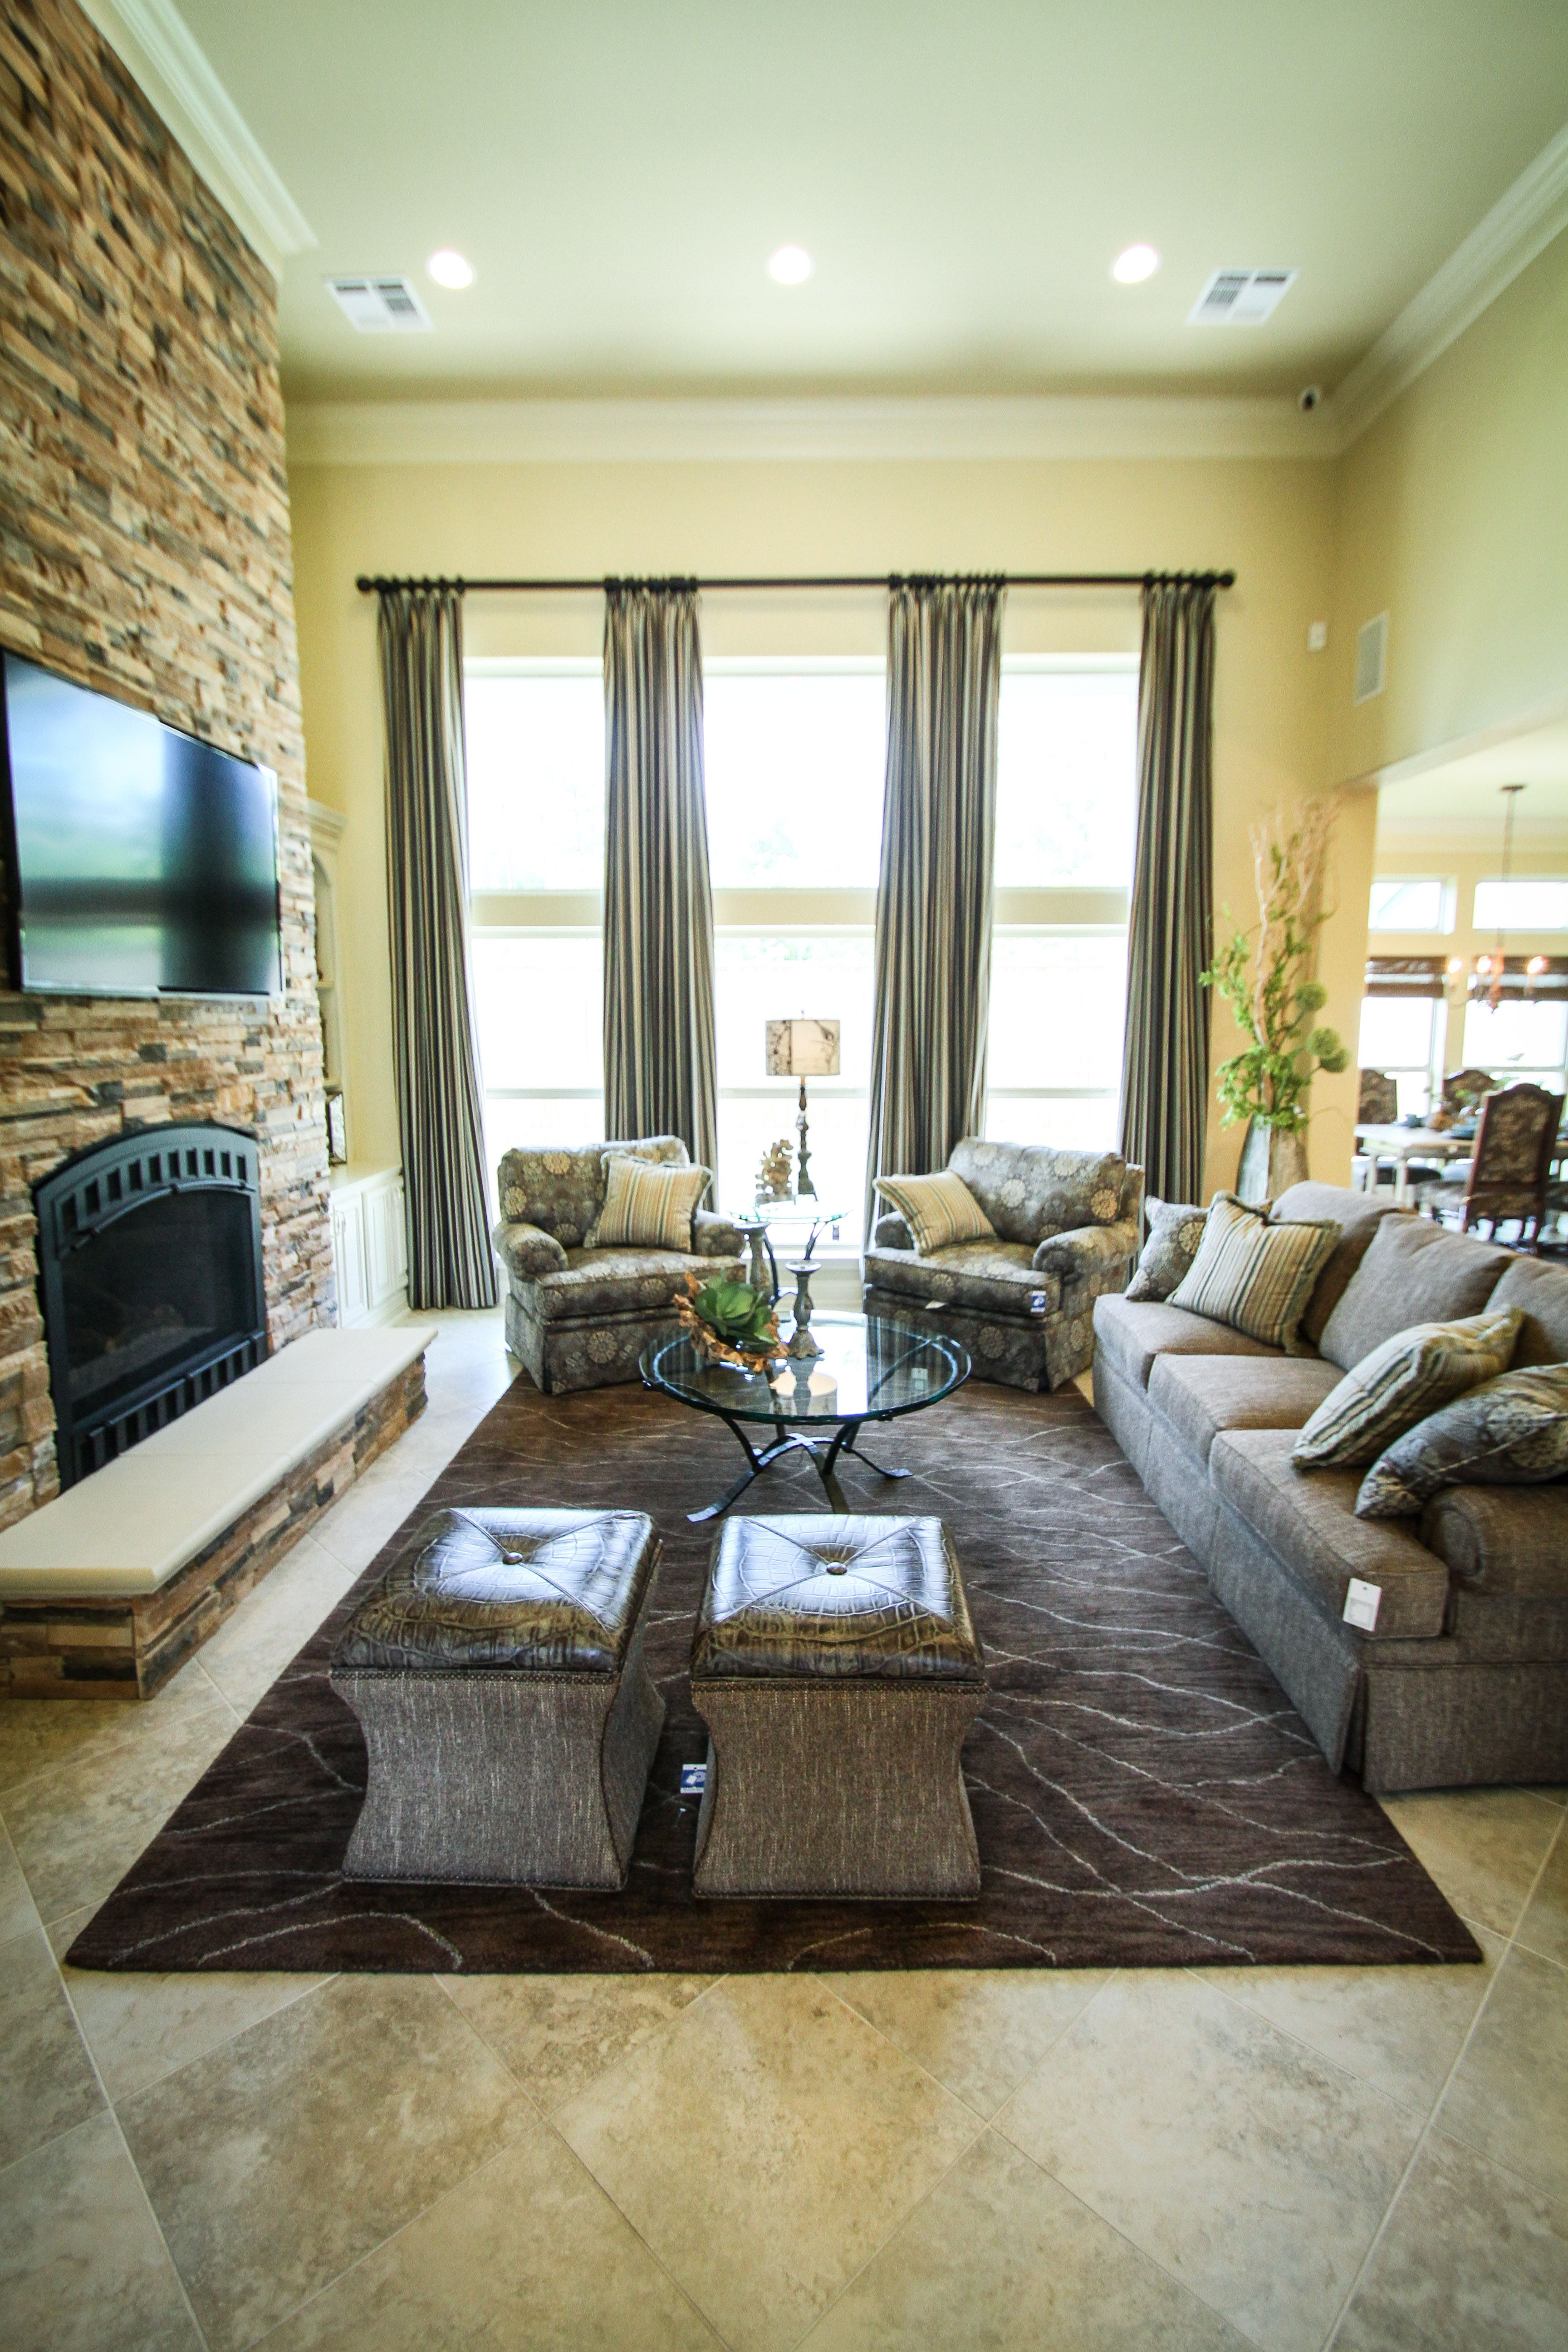 The Timbergrove Design tech homes, Home, House